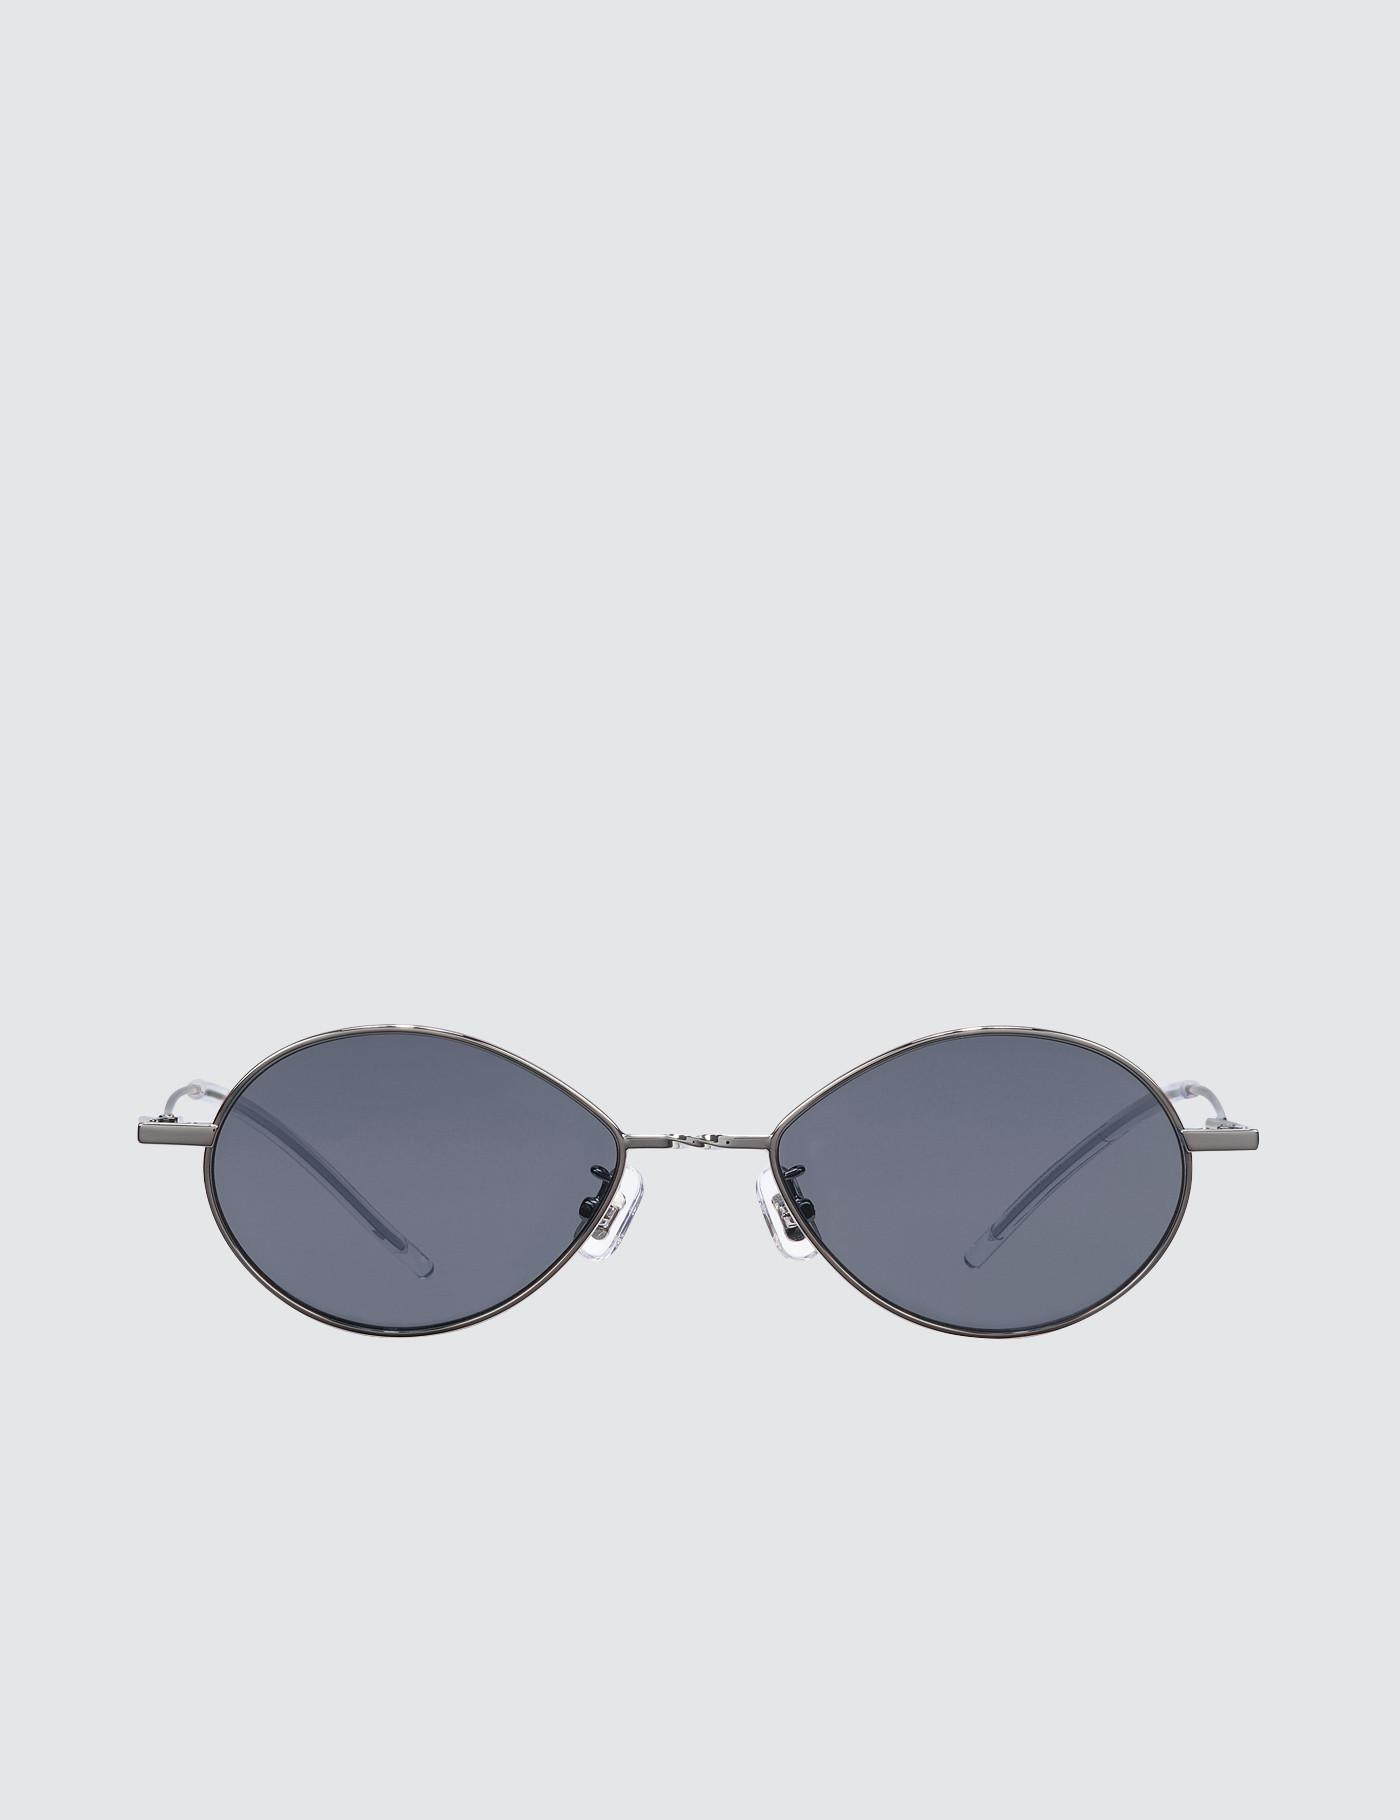 6759bf8b3c74 Lyst - Gentle Monster Cobalt Sunglasses in Black